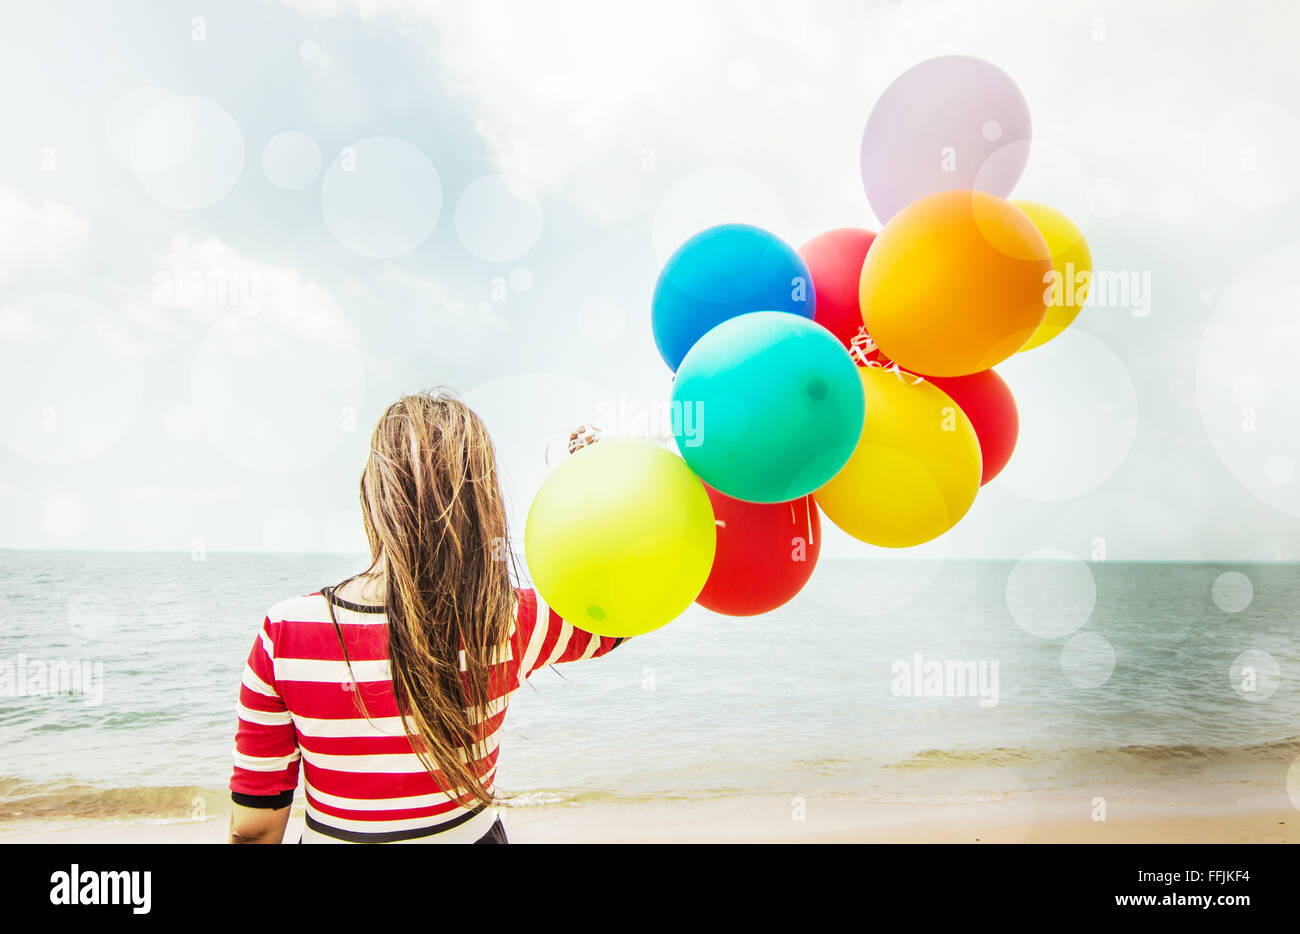 Frau mit bunten Luftballons am Strand, im freien Lebensstil filtert Bild Stockfoto